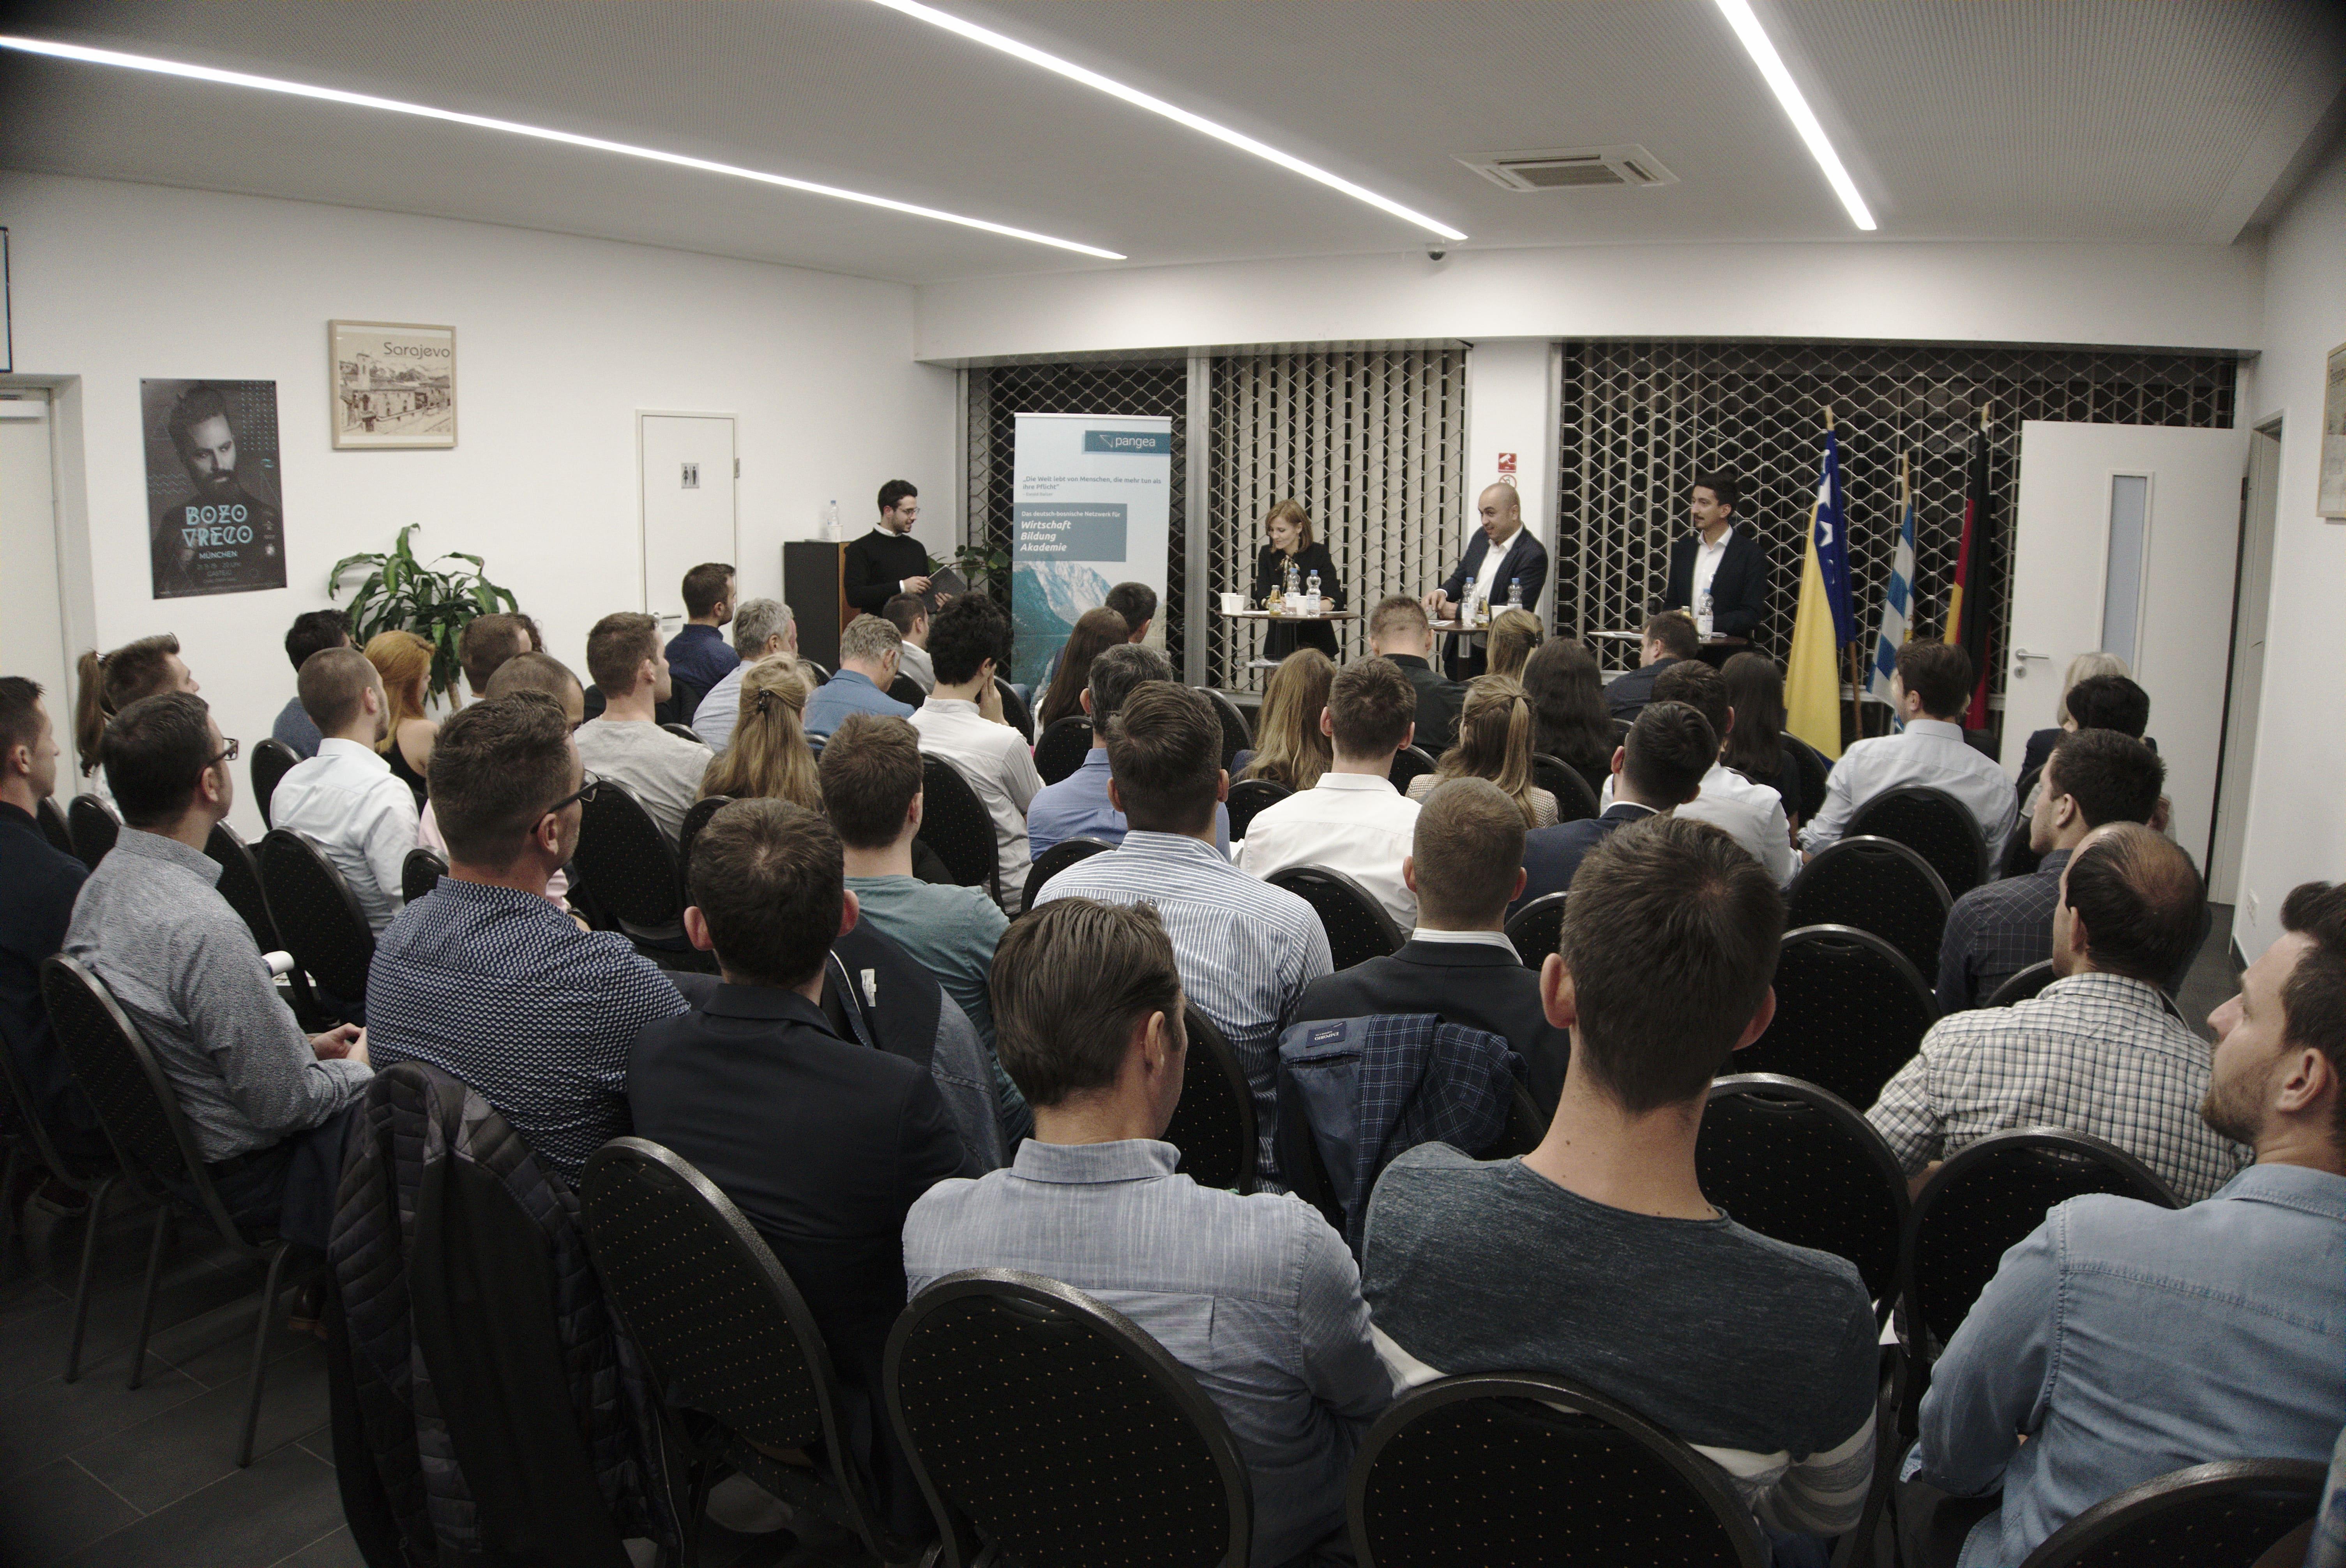 Impresije – Let´s connect 13. septembar 2019 | (Young) Professionals & Studenti iz Bosne i Hercegovine u regiji Minhen